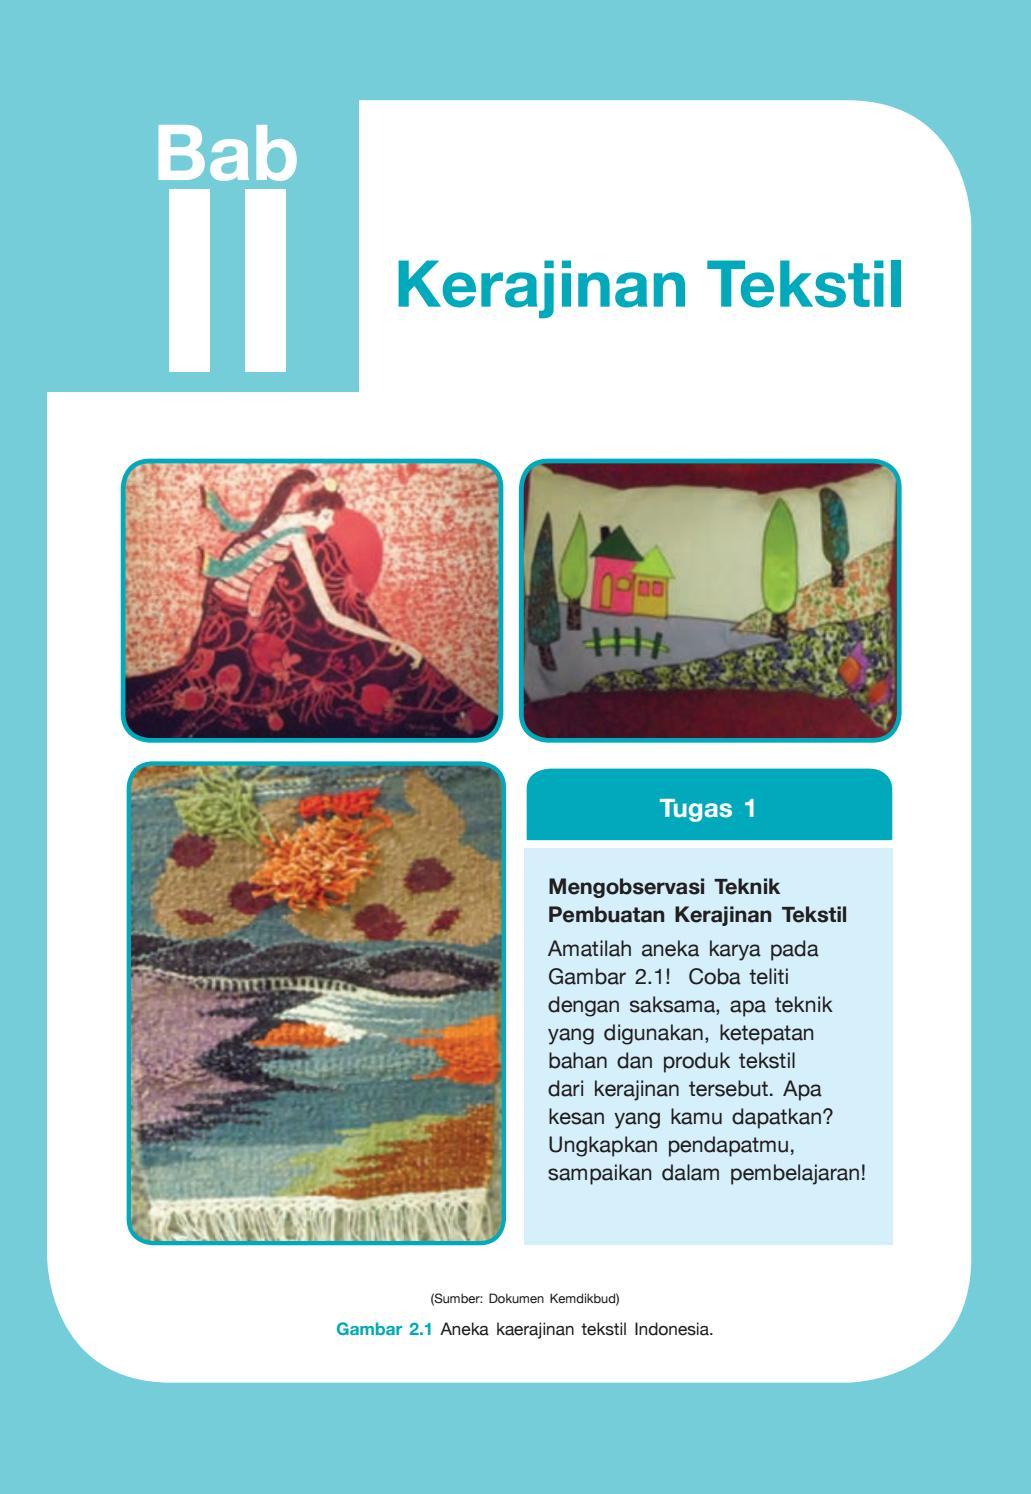 Proses Pembuatan Kerajinan Tekstil : proses, pembuatan, kerajinan, tekstil, Teknik, Pembuatan, Kerajinan, Tekstil, IlmuSosial.id